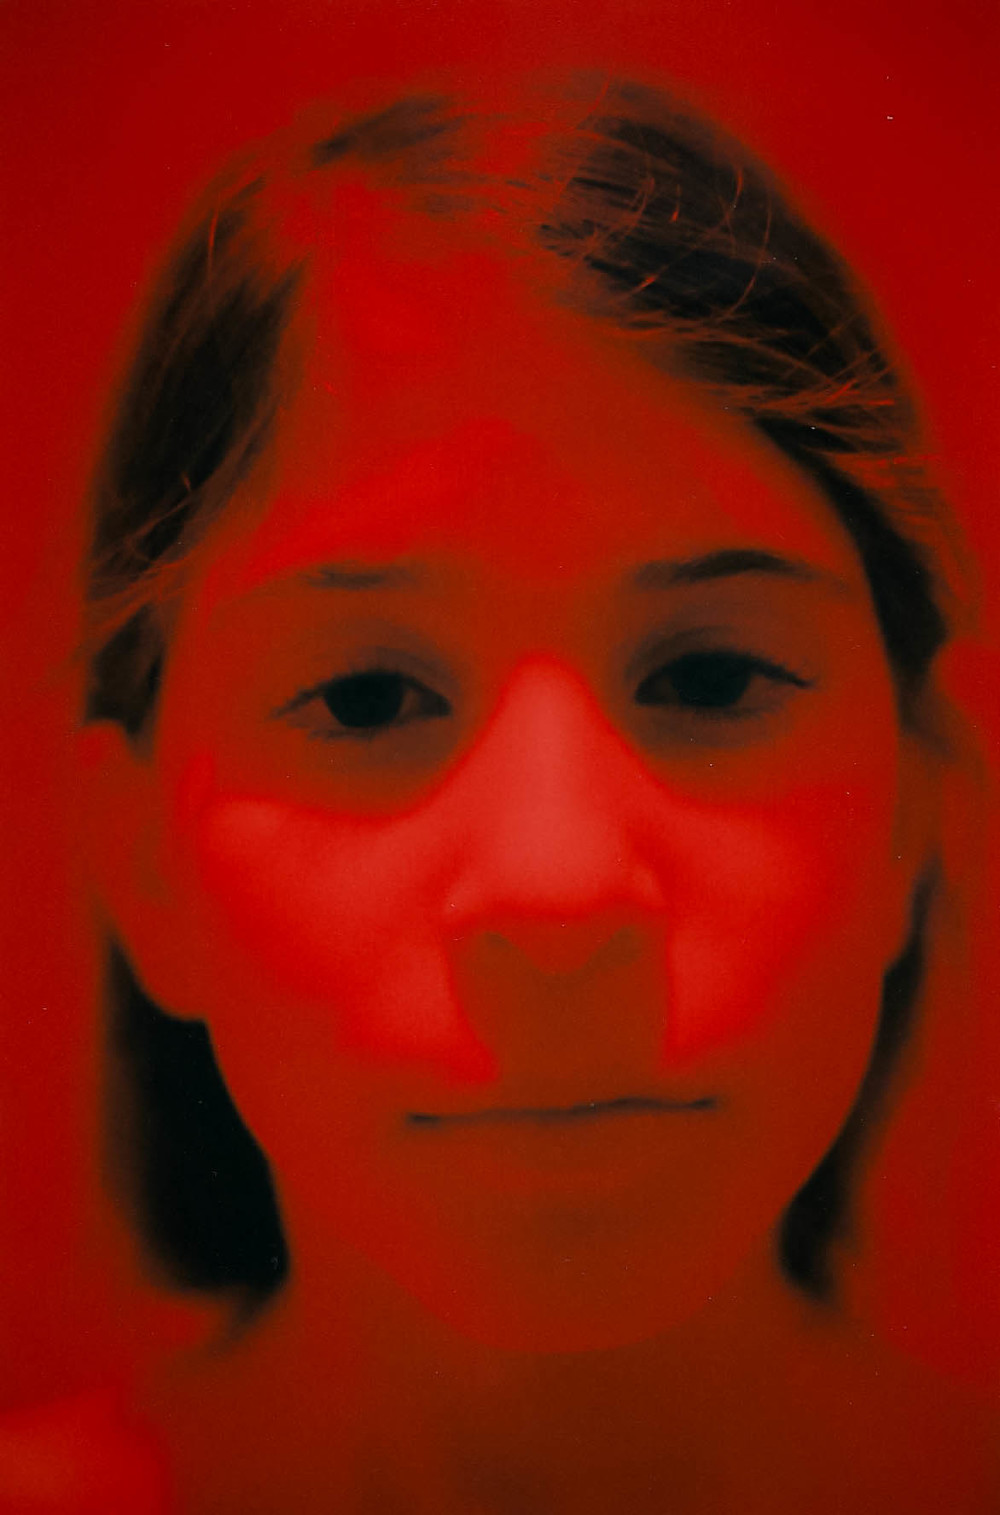 Gianna Under Heatlamp, 2016